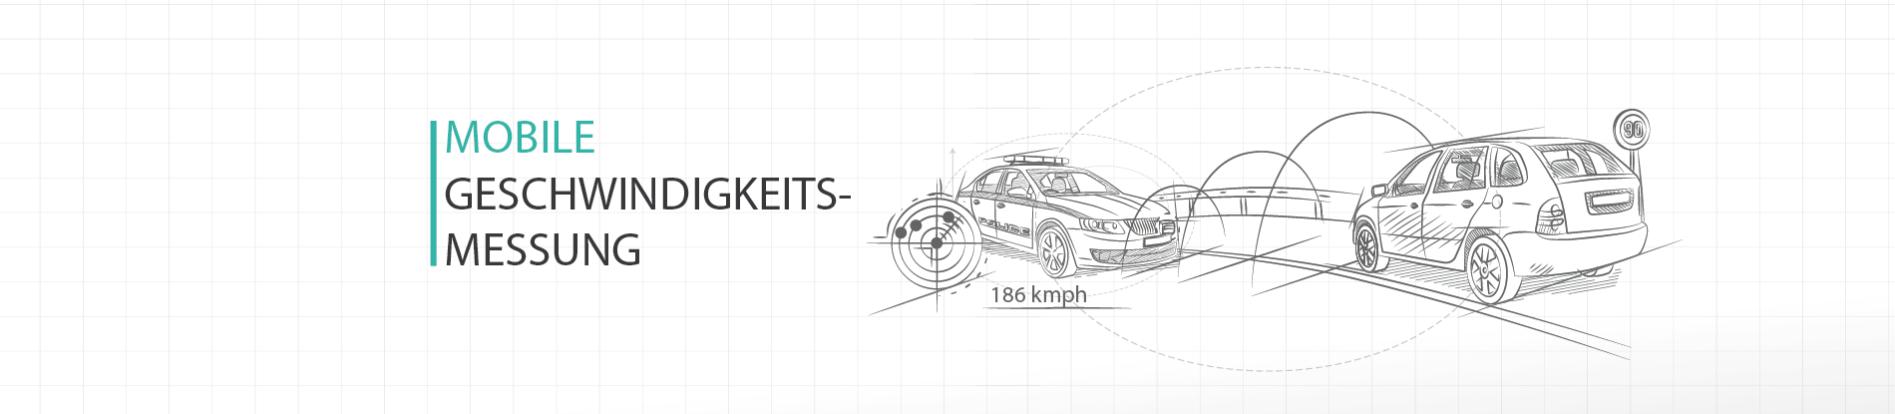 mobile speed measurement_ger